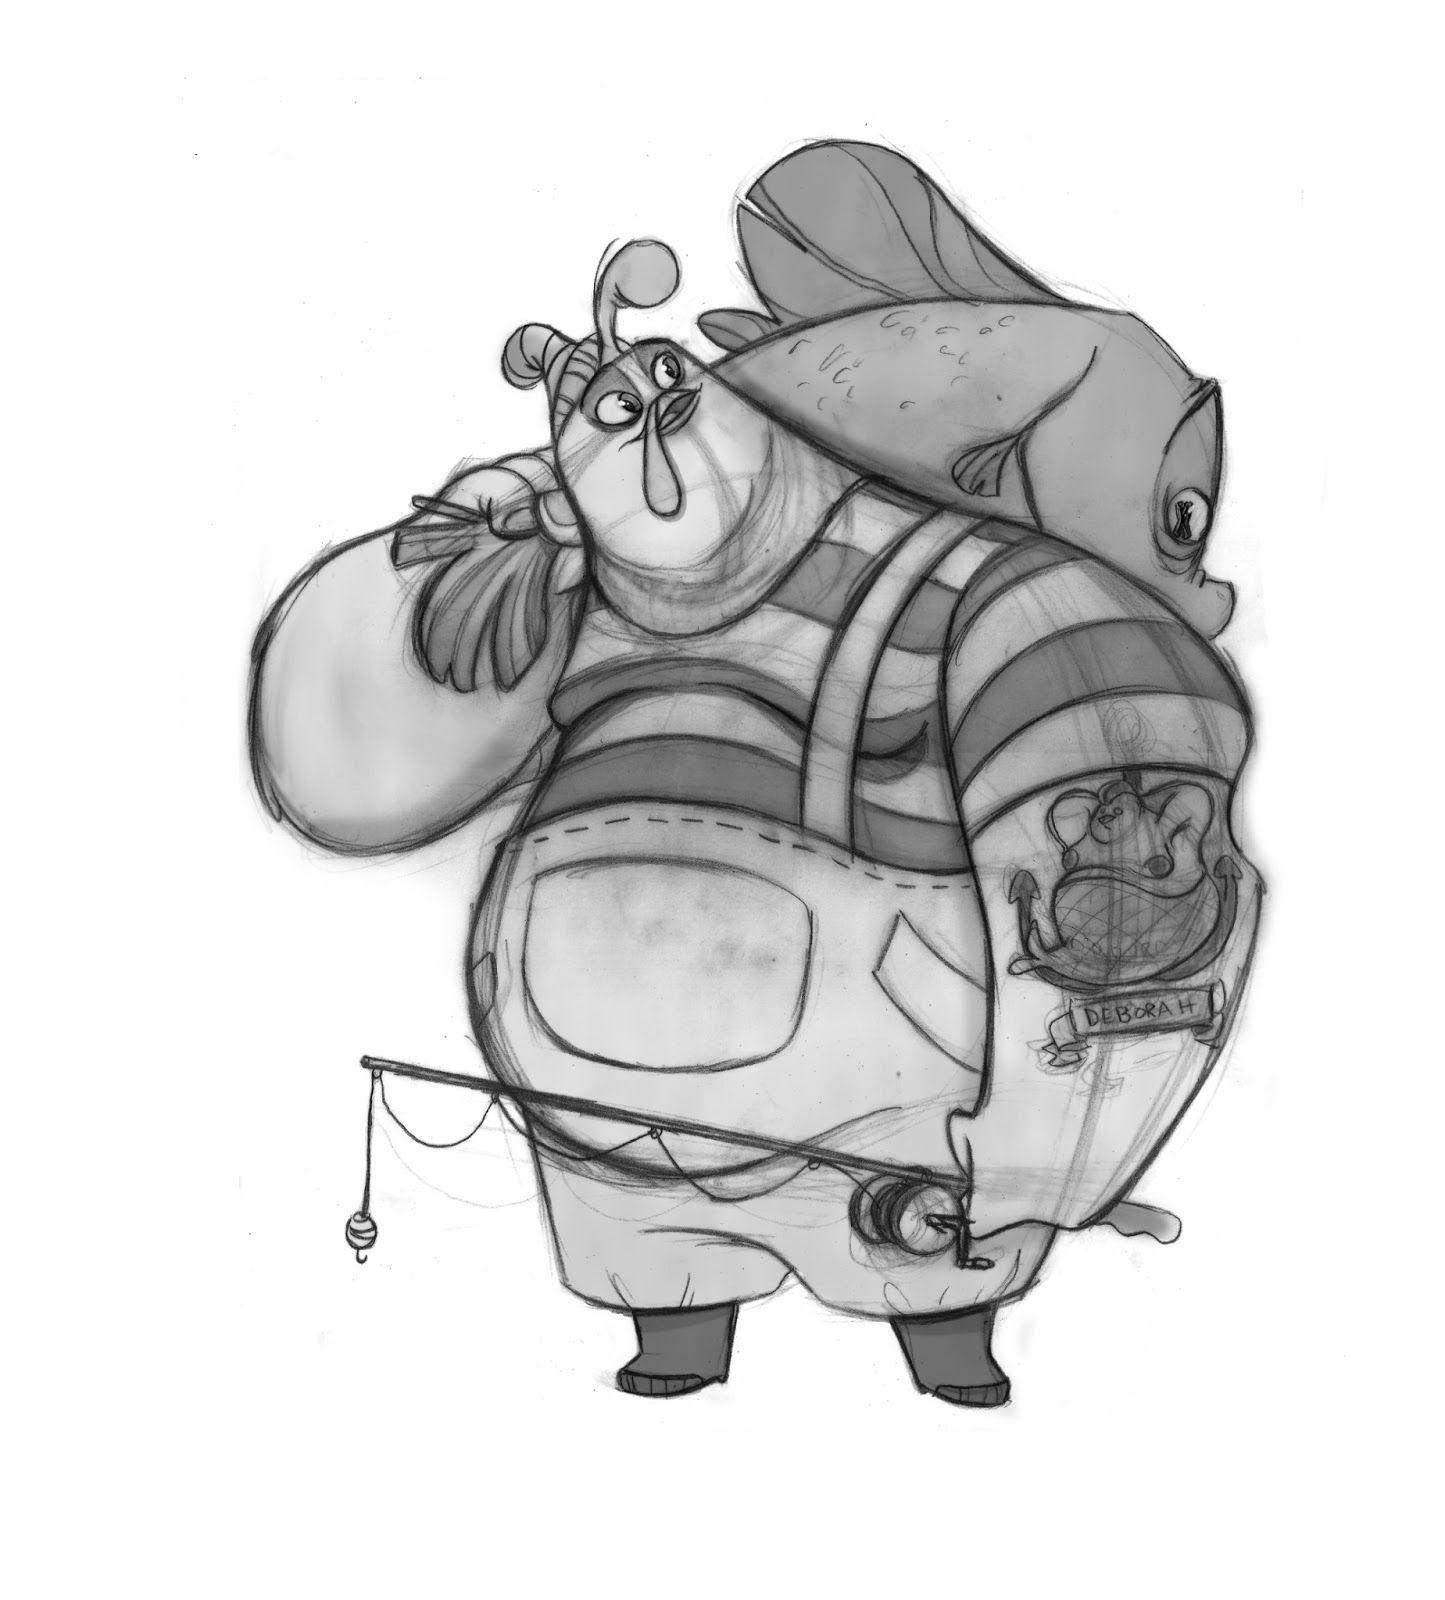 Art by Dan Seddon* - Blog/Website | (http://danseddon13.tumblr.com) • Online Store | (http://www.danseddon.bigcartel.com) ★ || CHARACTER DESIGN REFERENCES™ (https://www.facebook.com/CharacterDesignReferences & https://www.pinterest.com/characterdesigh) • Love Character Design? Join the #CDChallenge (link→ https://www.facebook.com/groups/CharacterDesignChallenge) Share your unique vision of a theme, promote your art in a community of over 50.000 artists! || ★